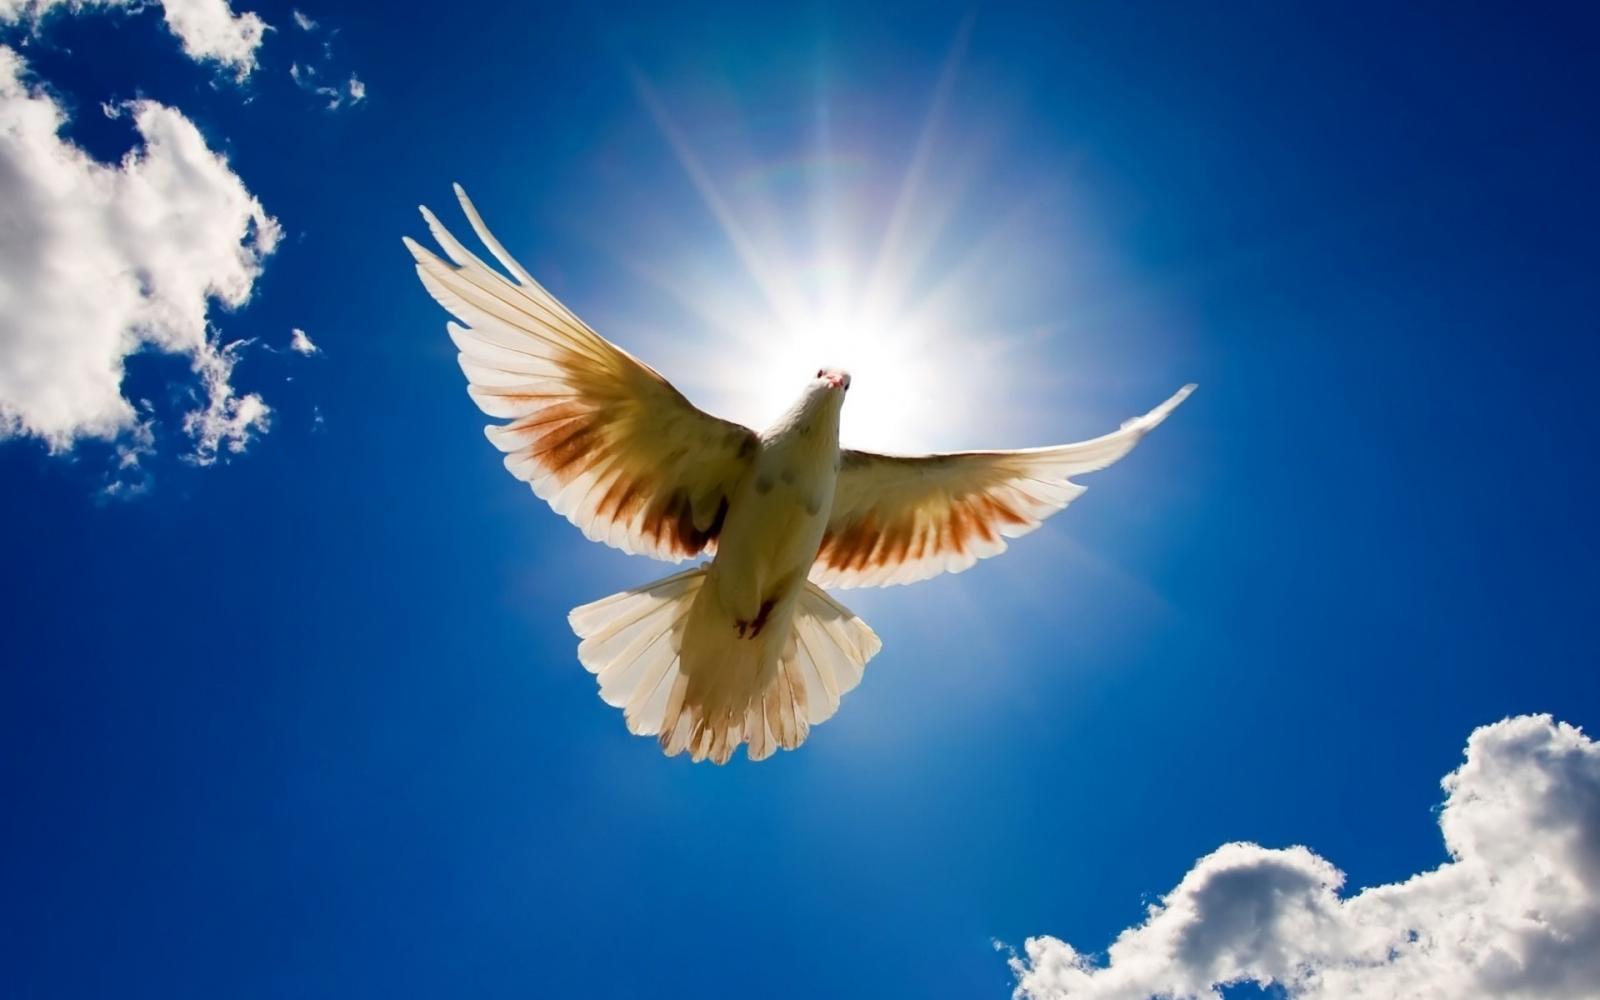 Молитва Ефрема Сирина, или Молитва о независимости: что в ней ...